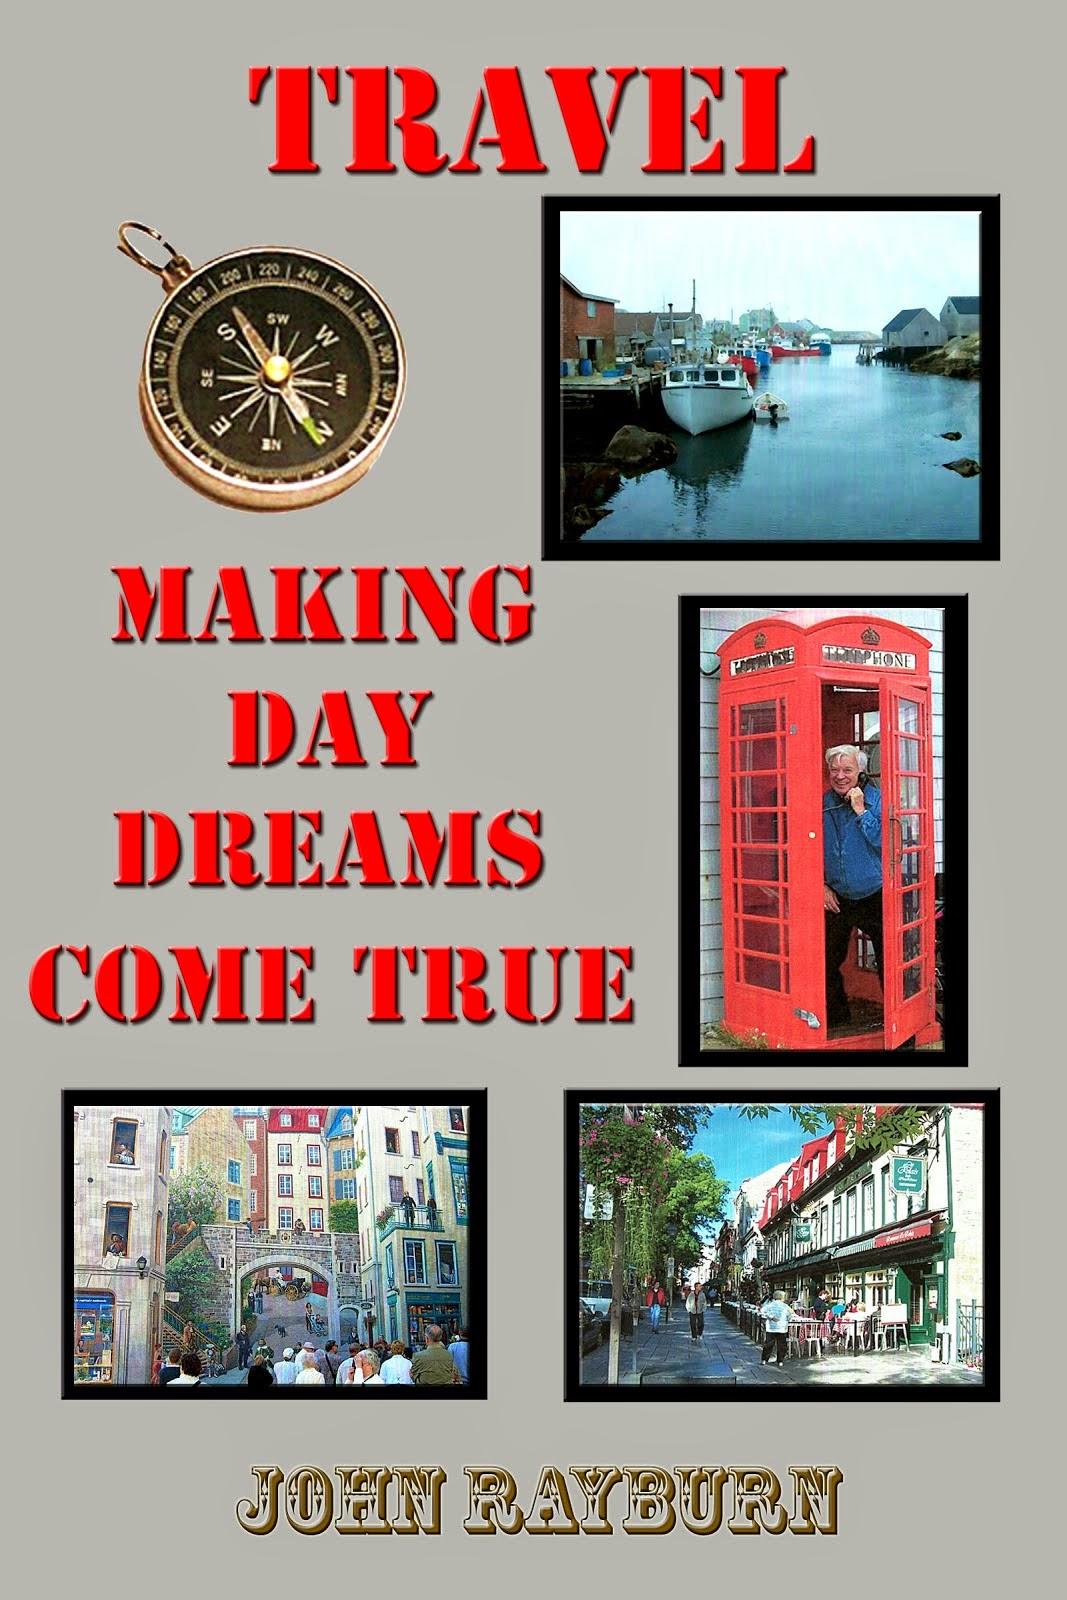 TRAVEL: Making Day Dreams Come True